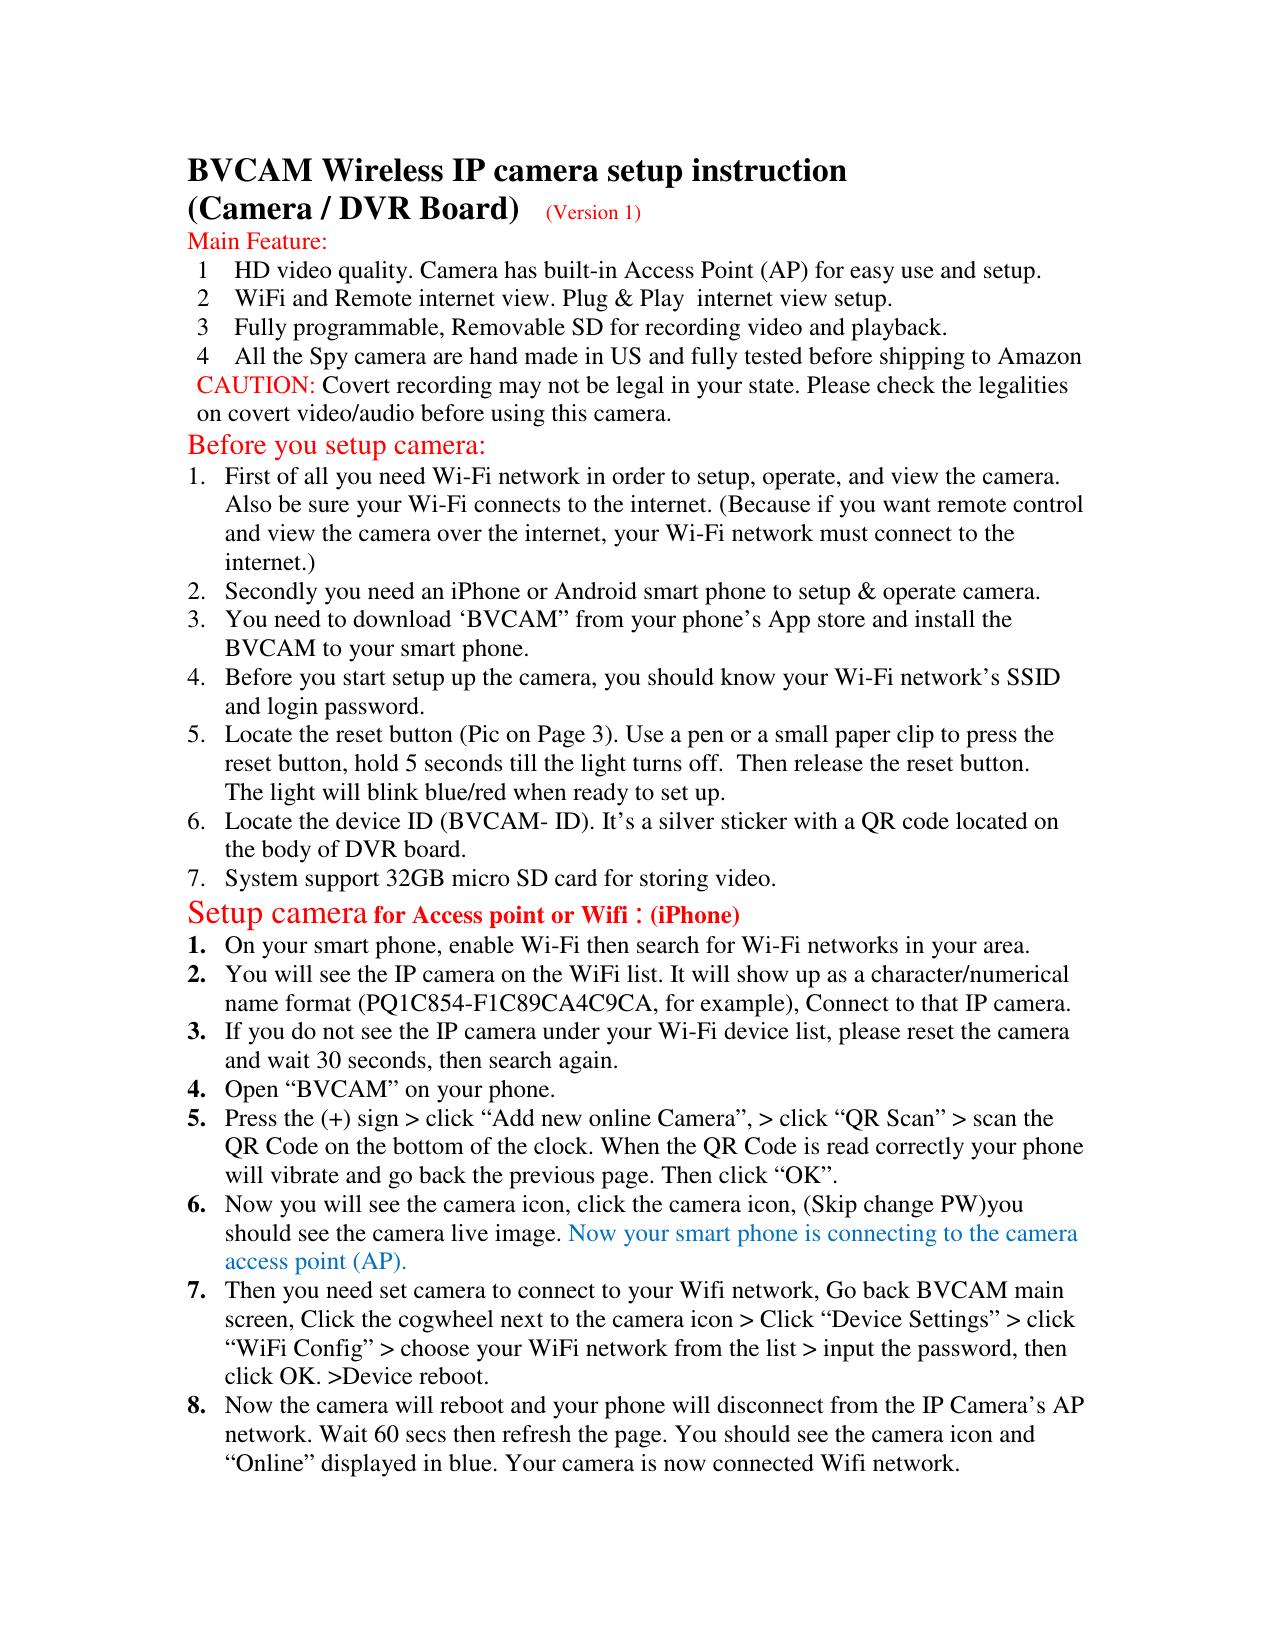 BVCAM Wireless IP camera setup instruction (Camera / DVR Board